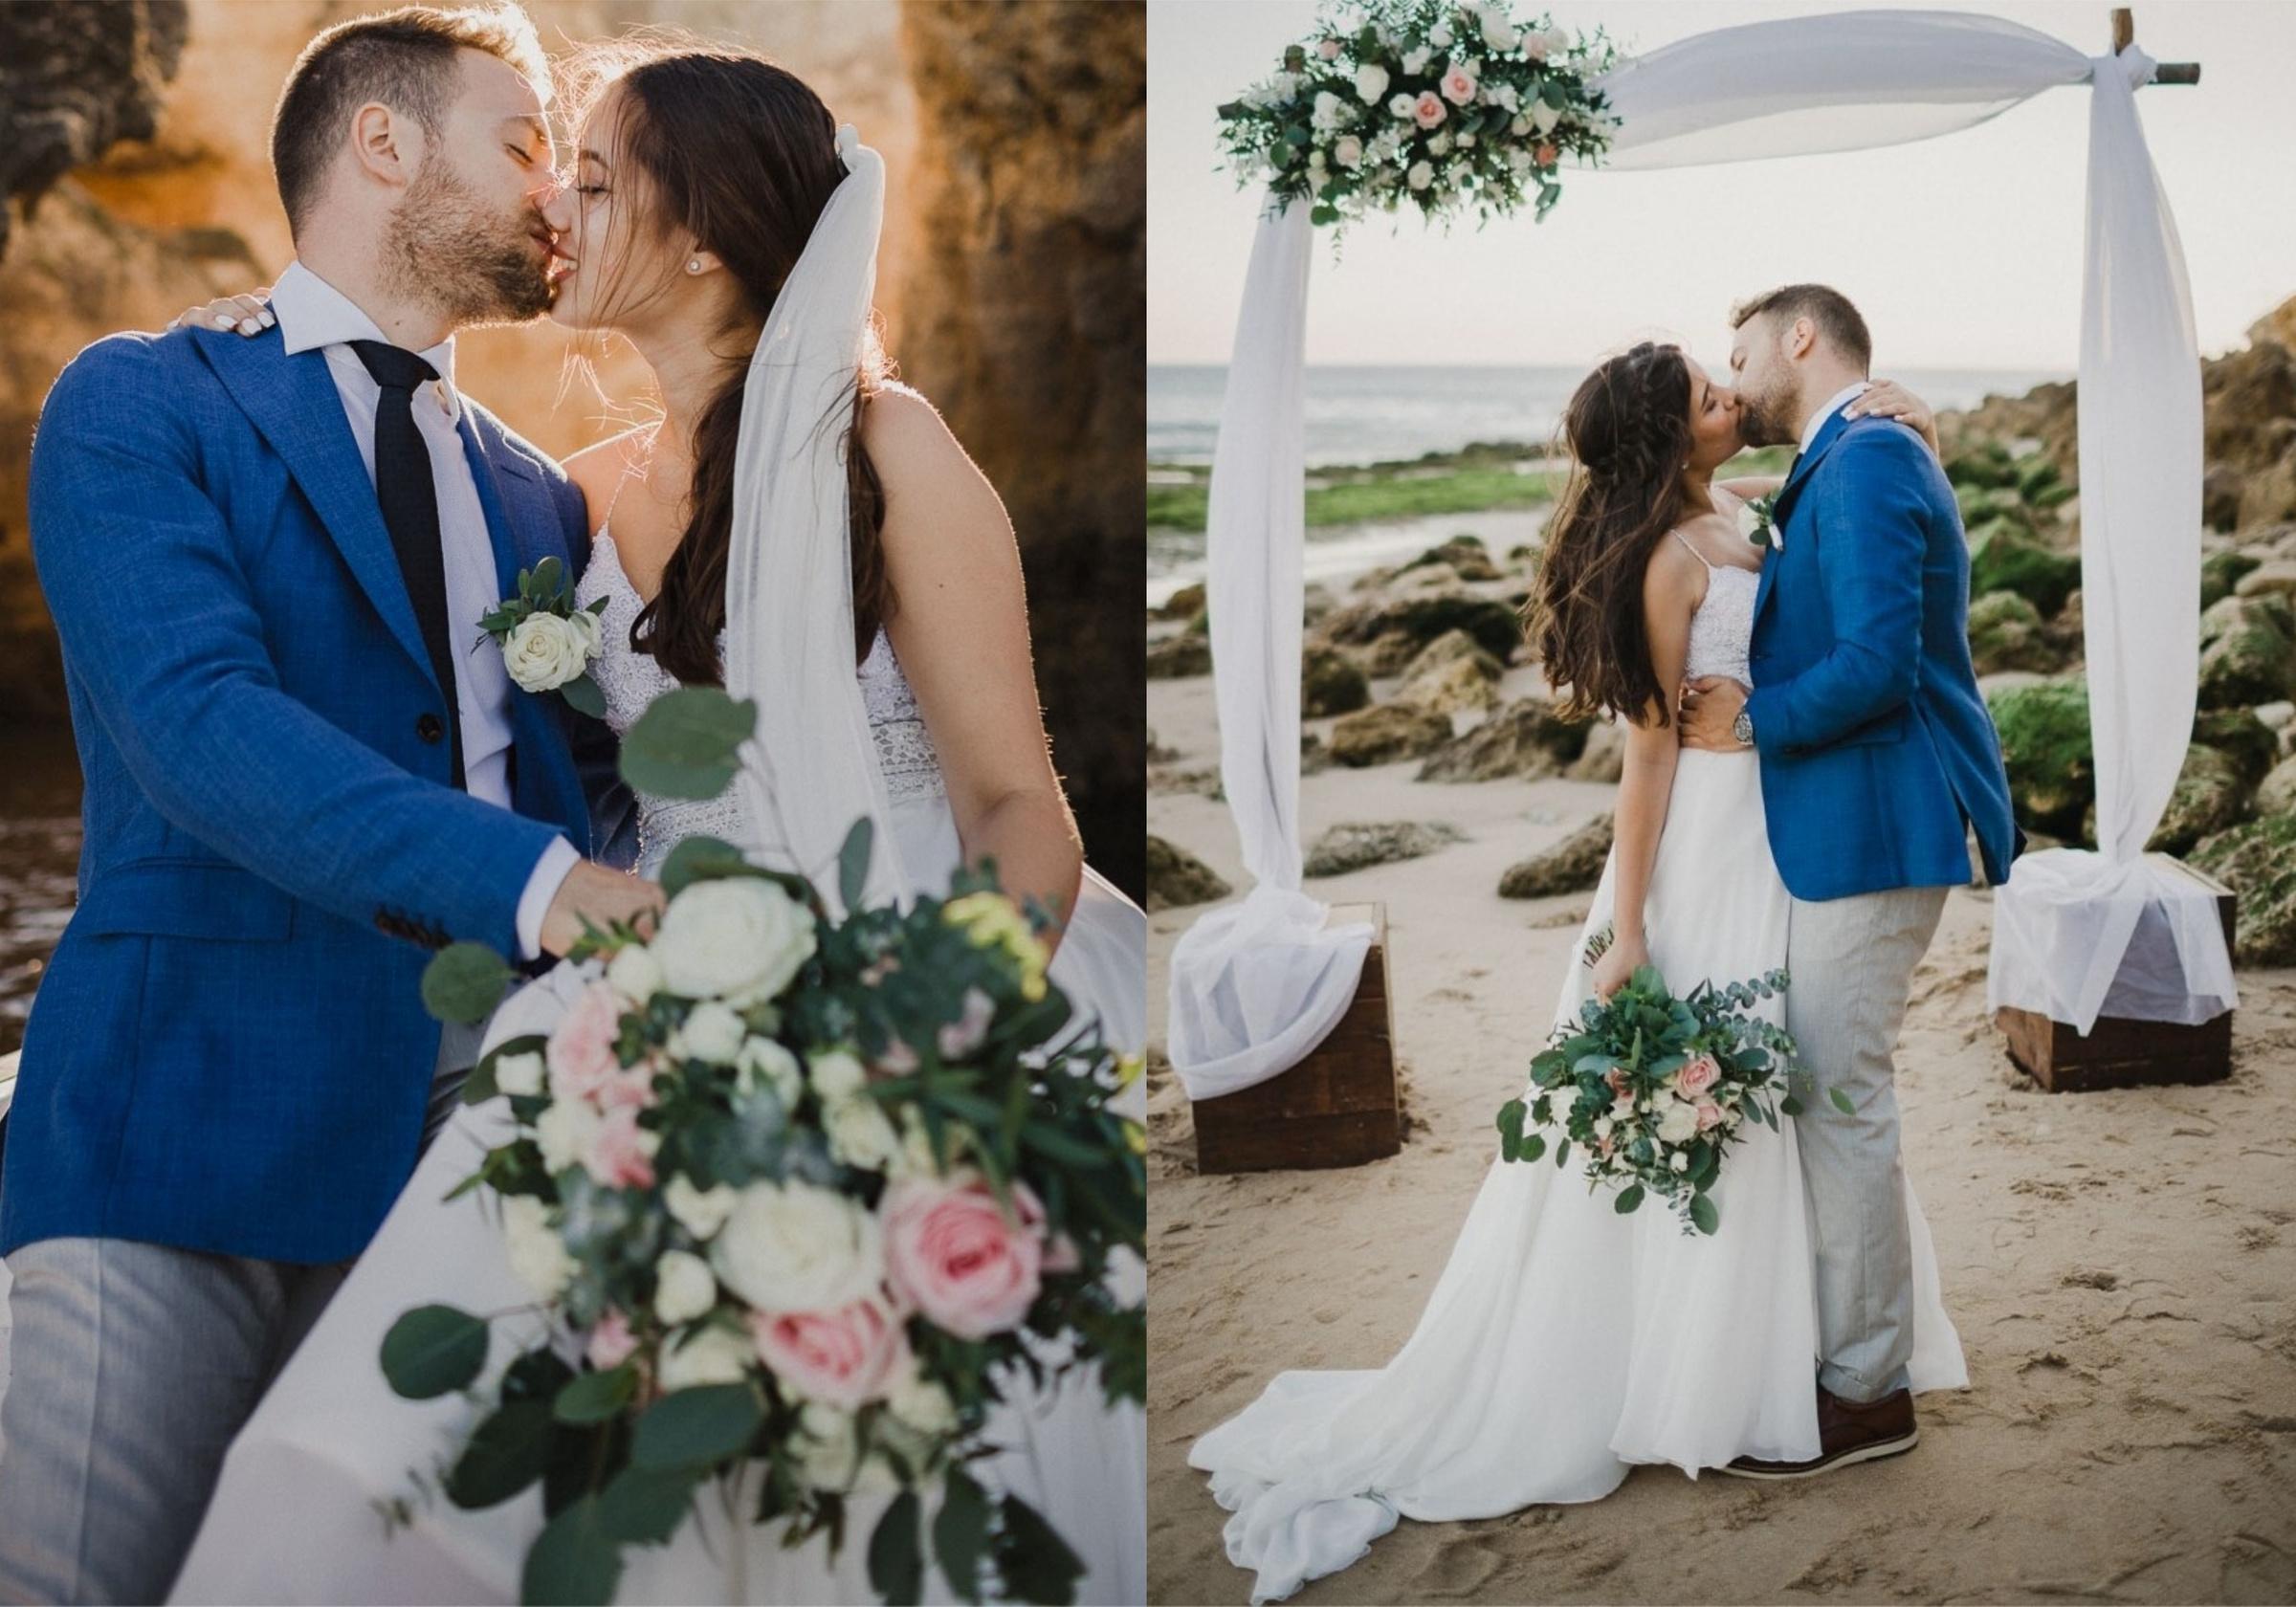 Фото © Facebook / Maria & Sandy Algarve Wedding Photographer